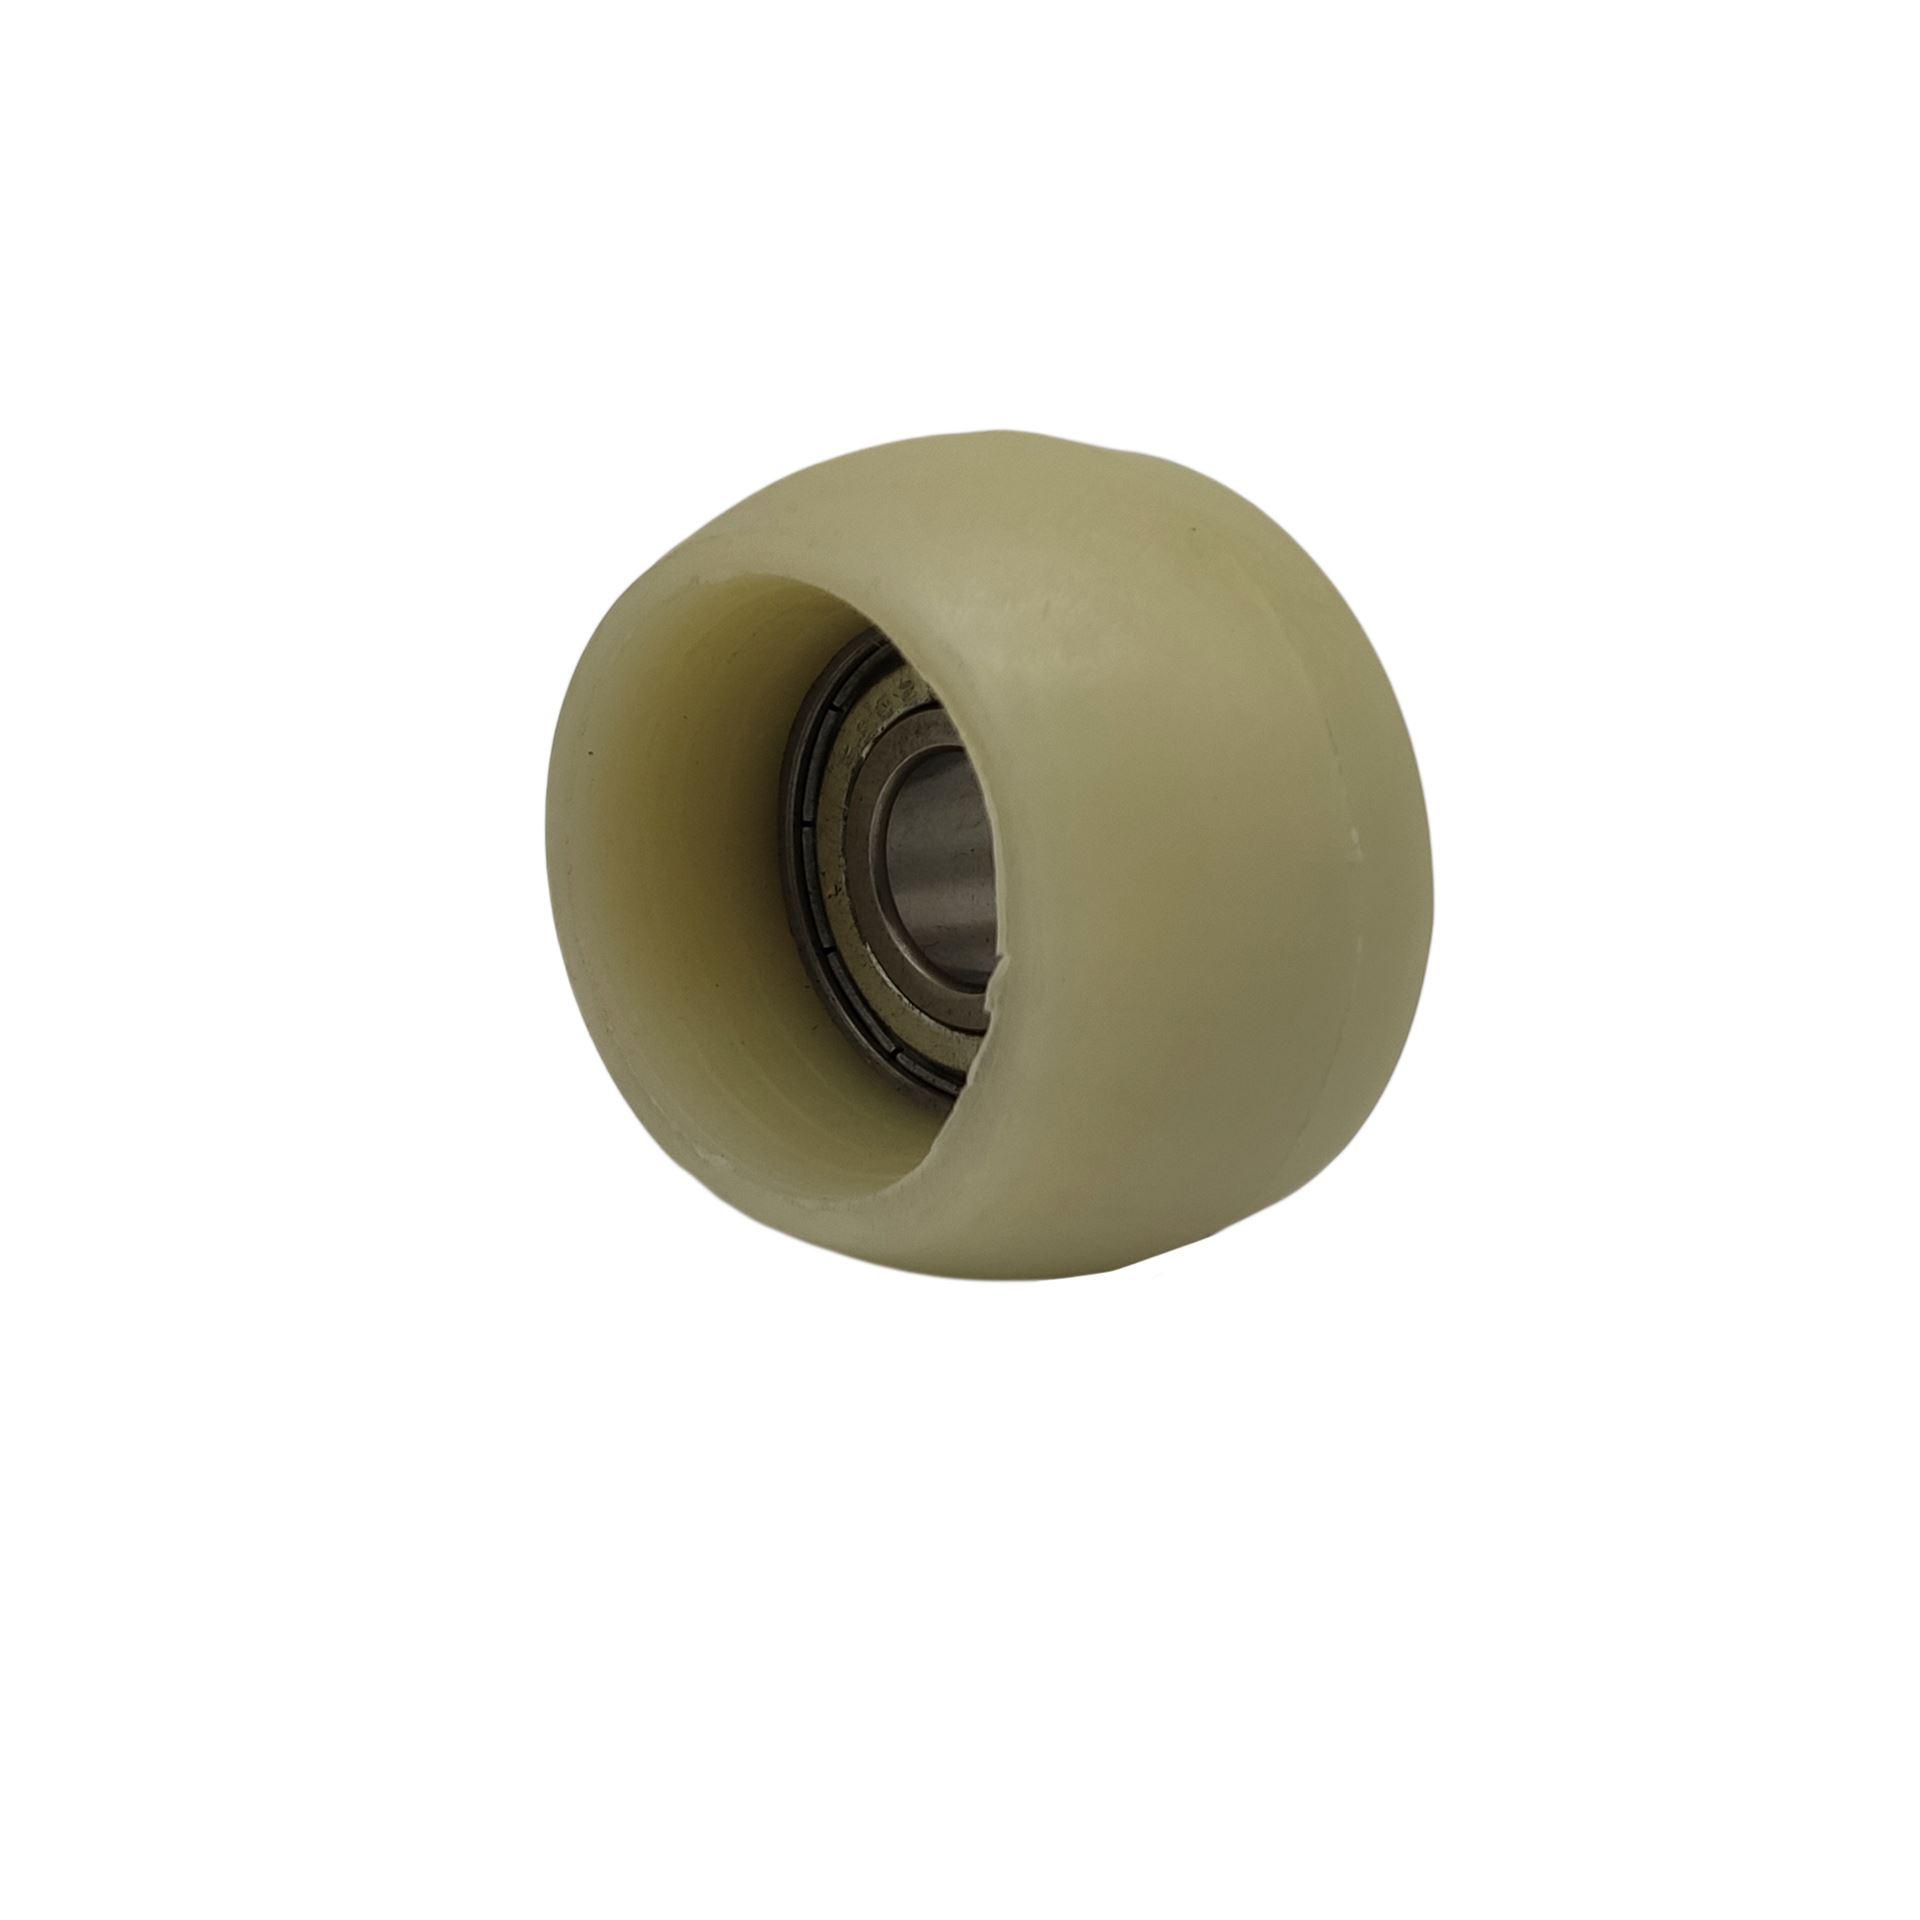 Imagen de Rodillo nylon con rodamiento 96015000